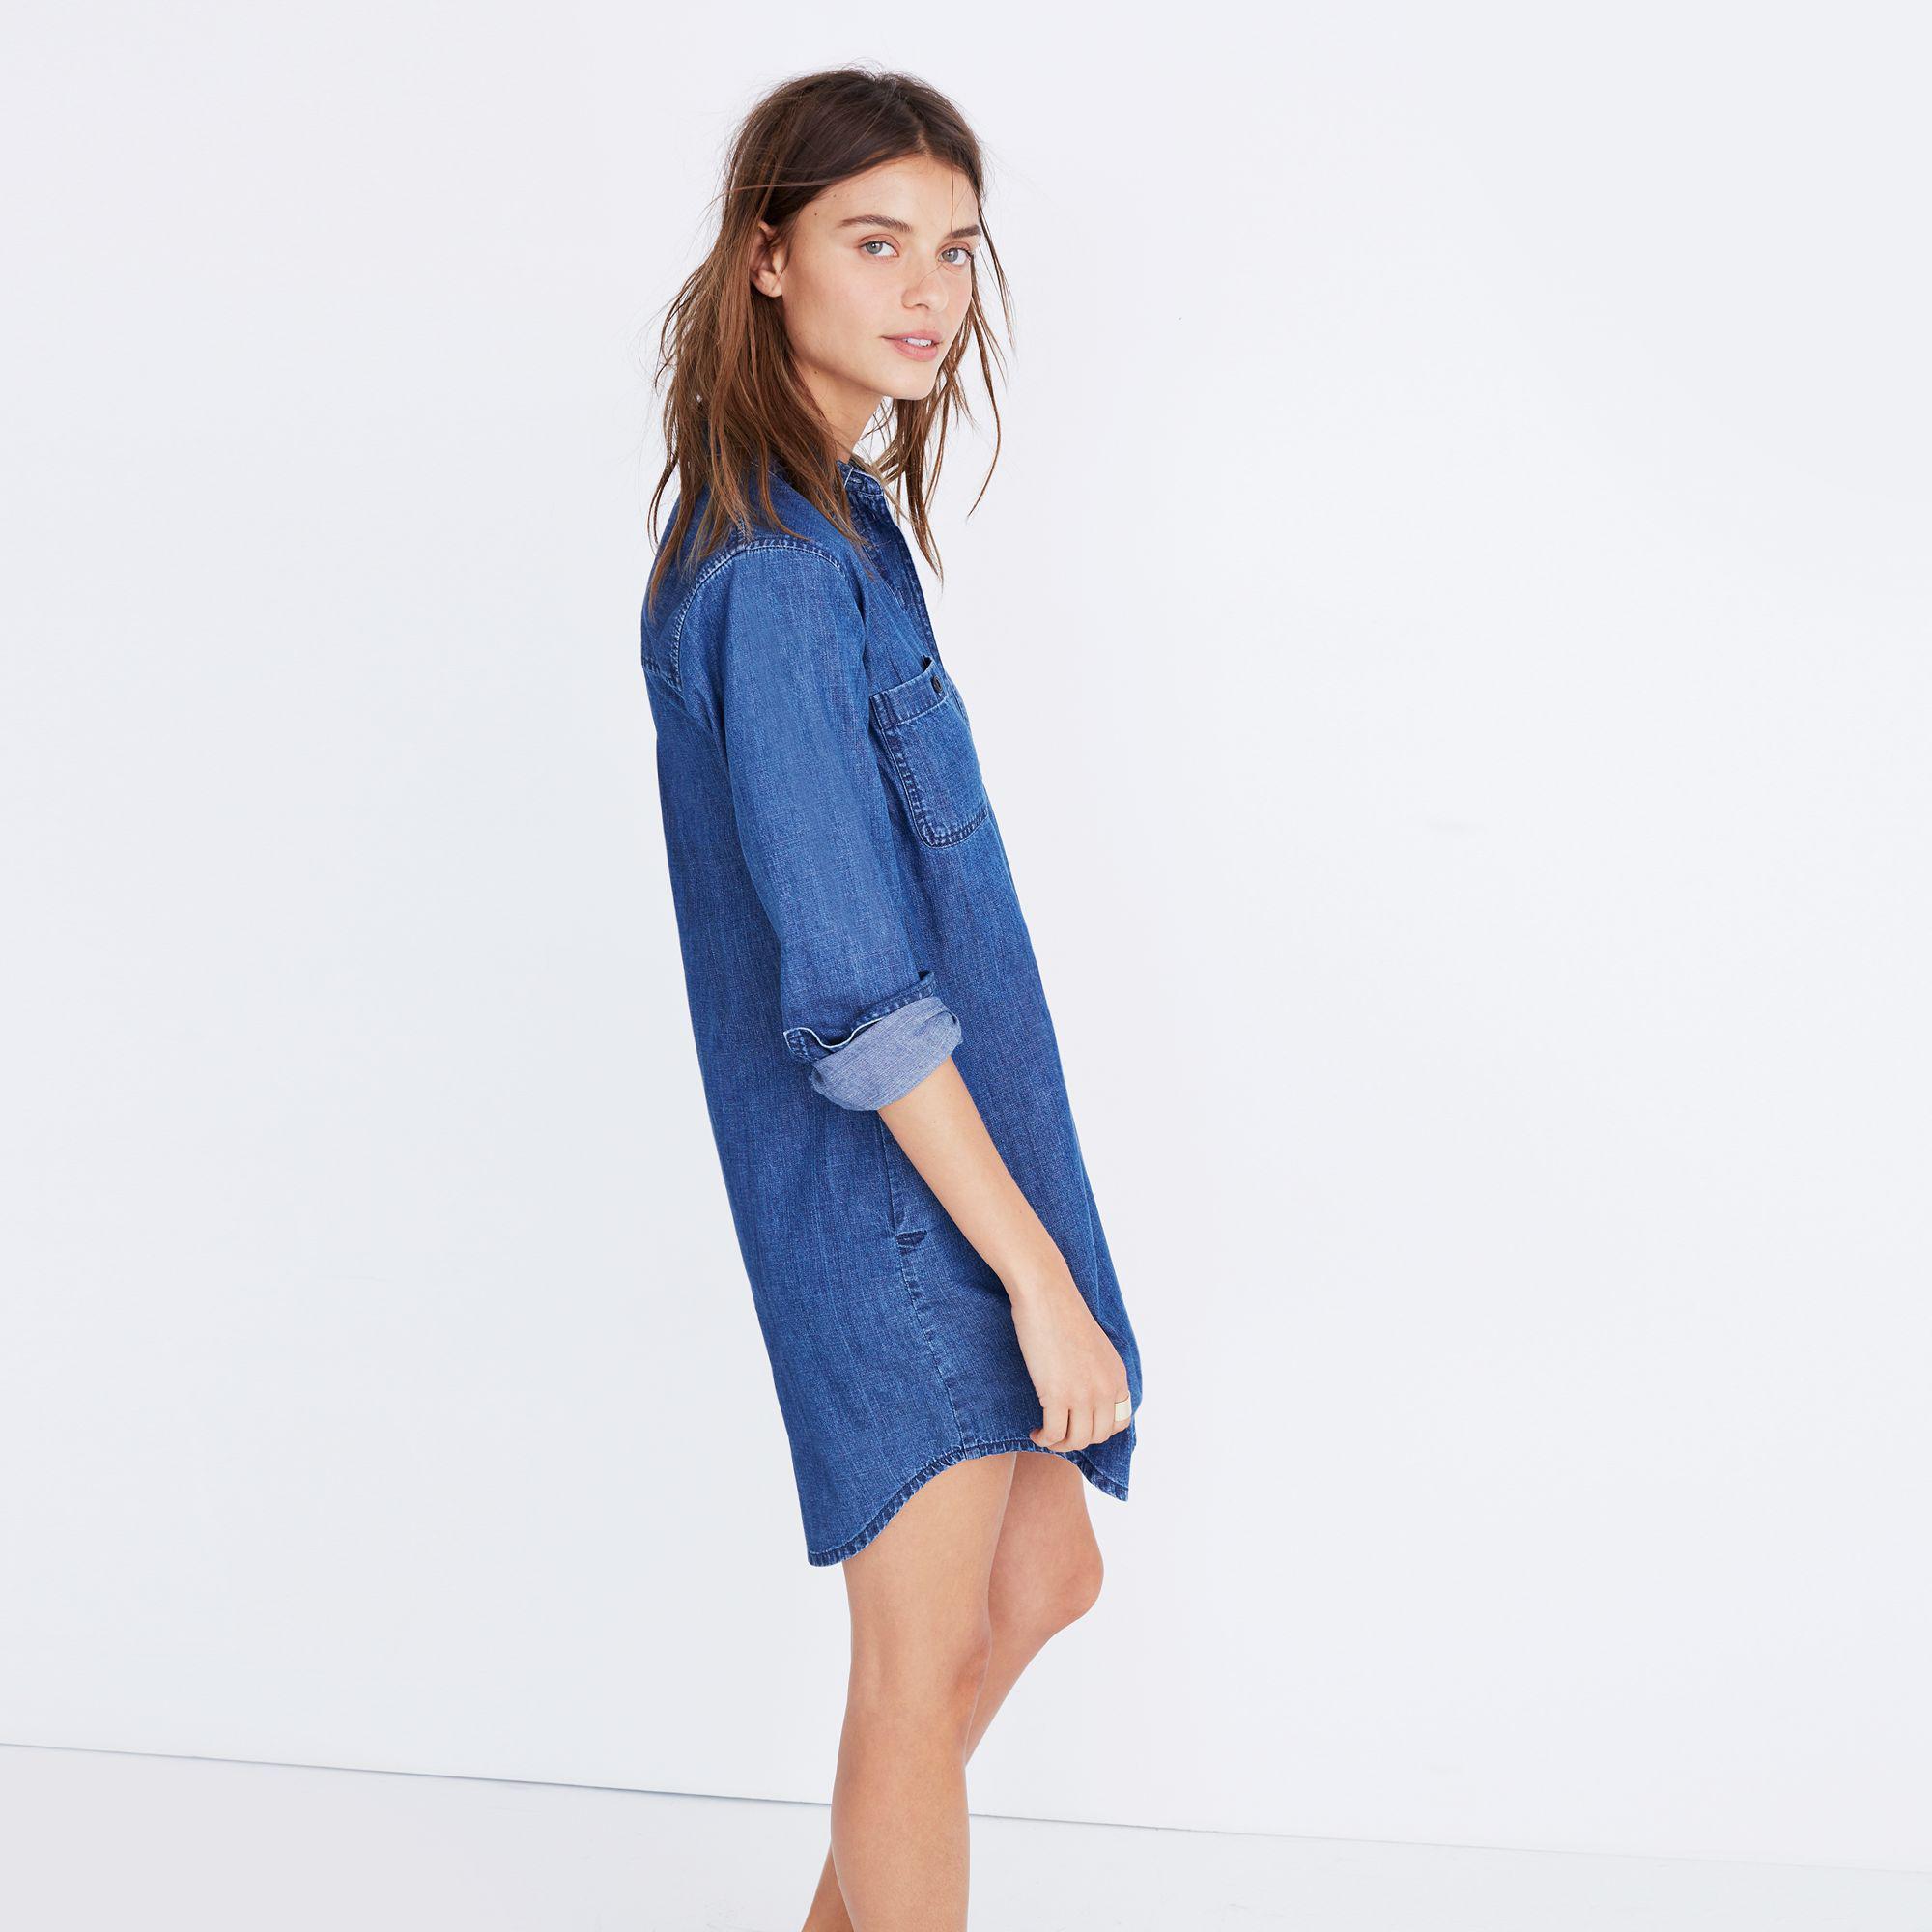 c2b62966770 Lyst - Madewell Denim Popover Shirtdress in Blue